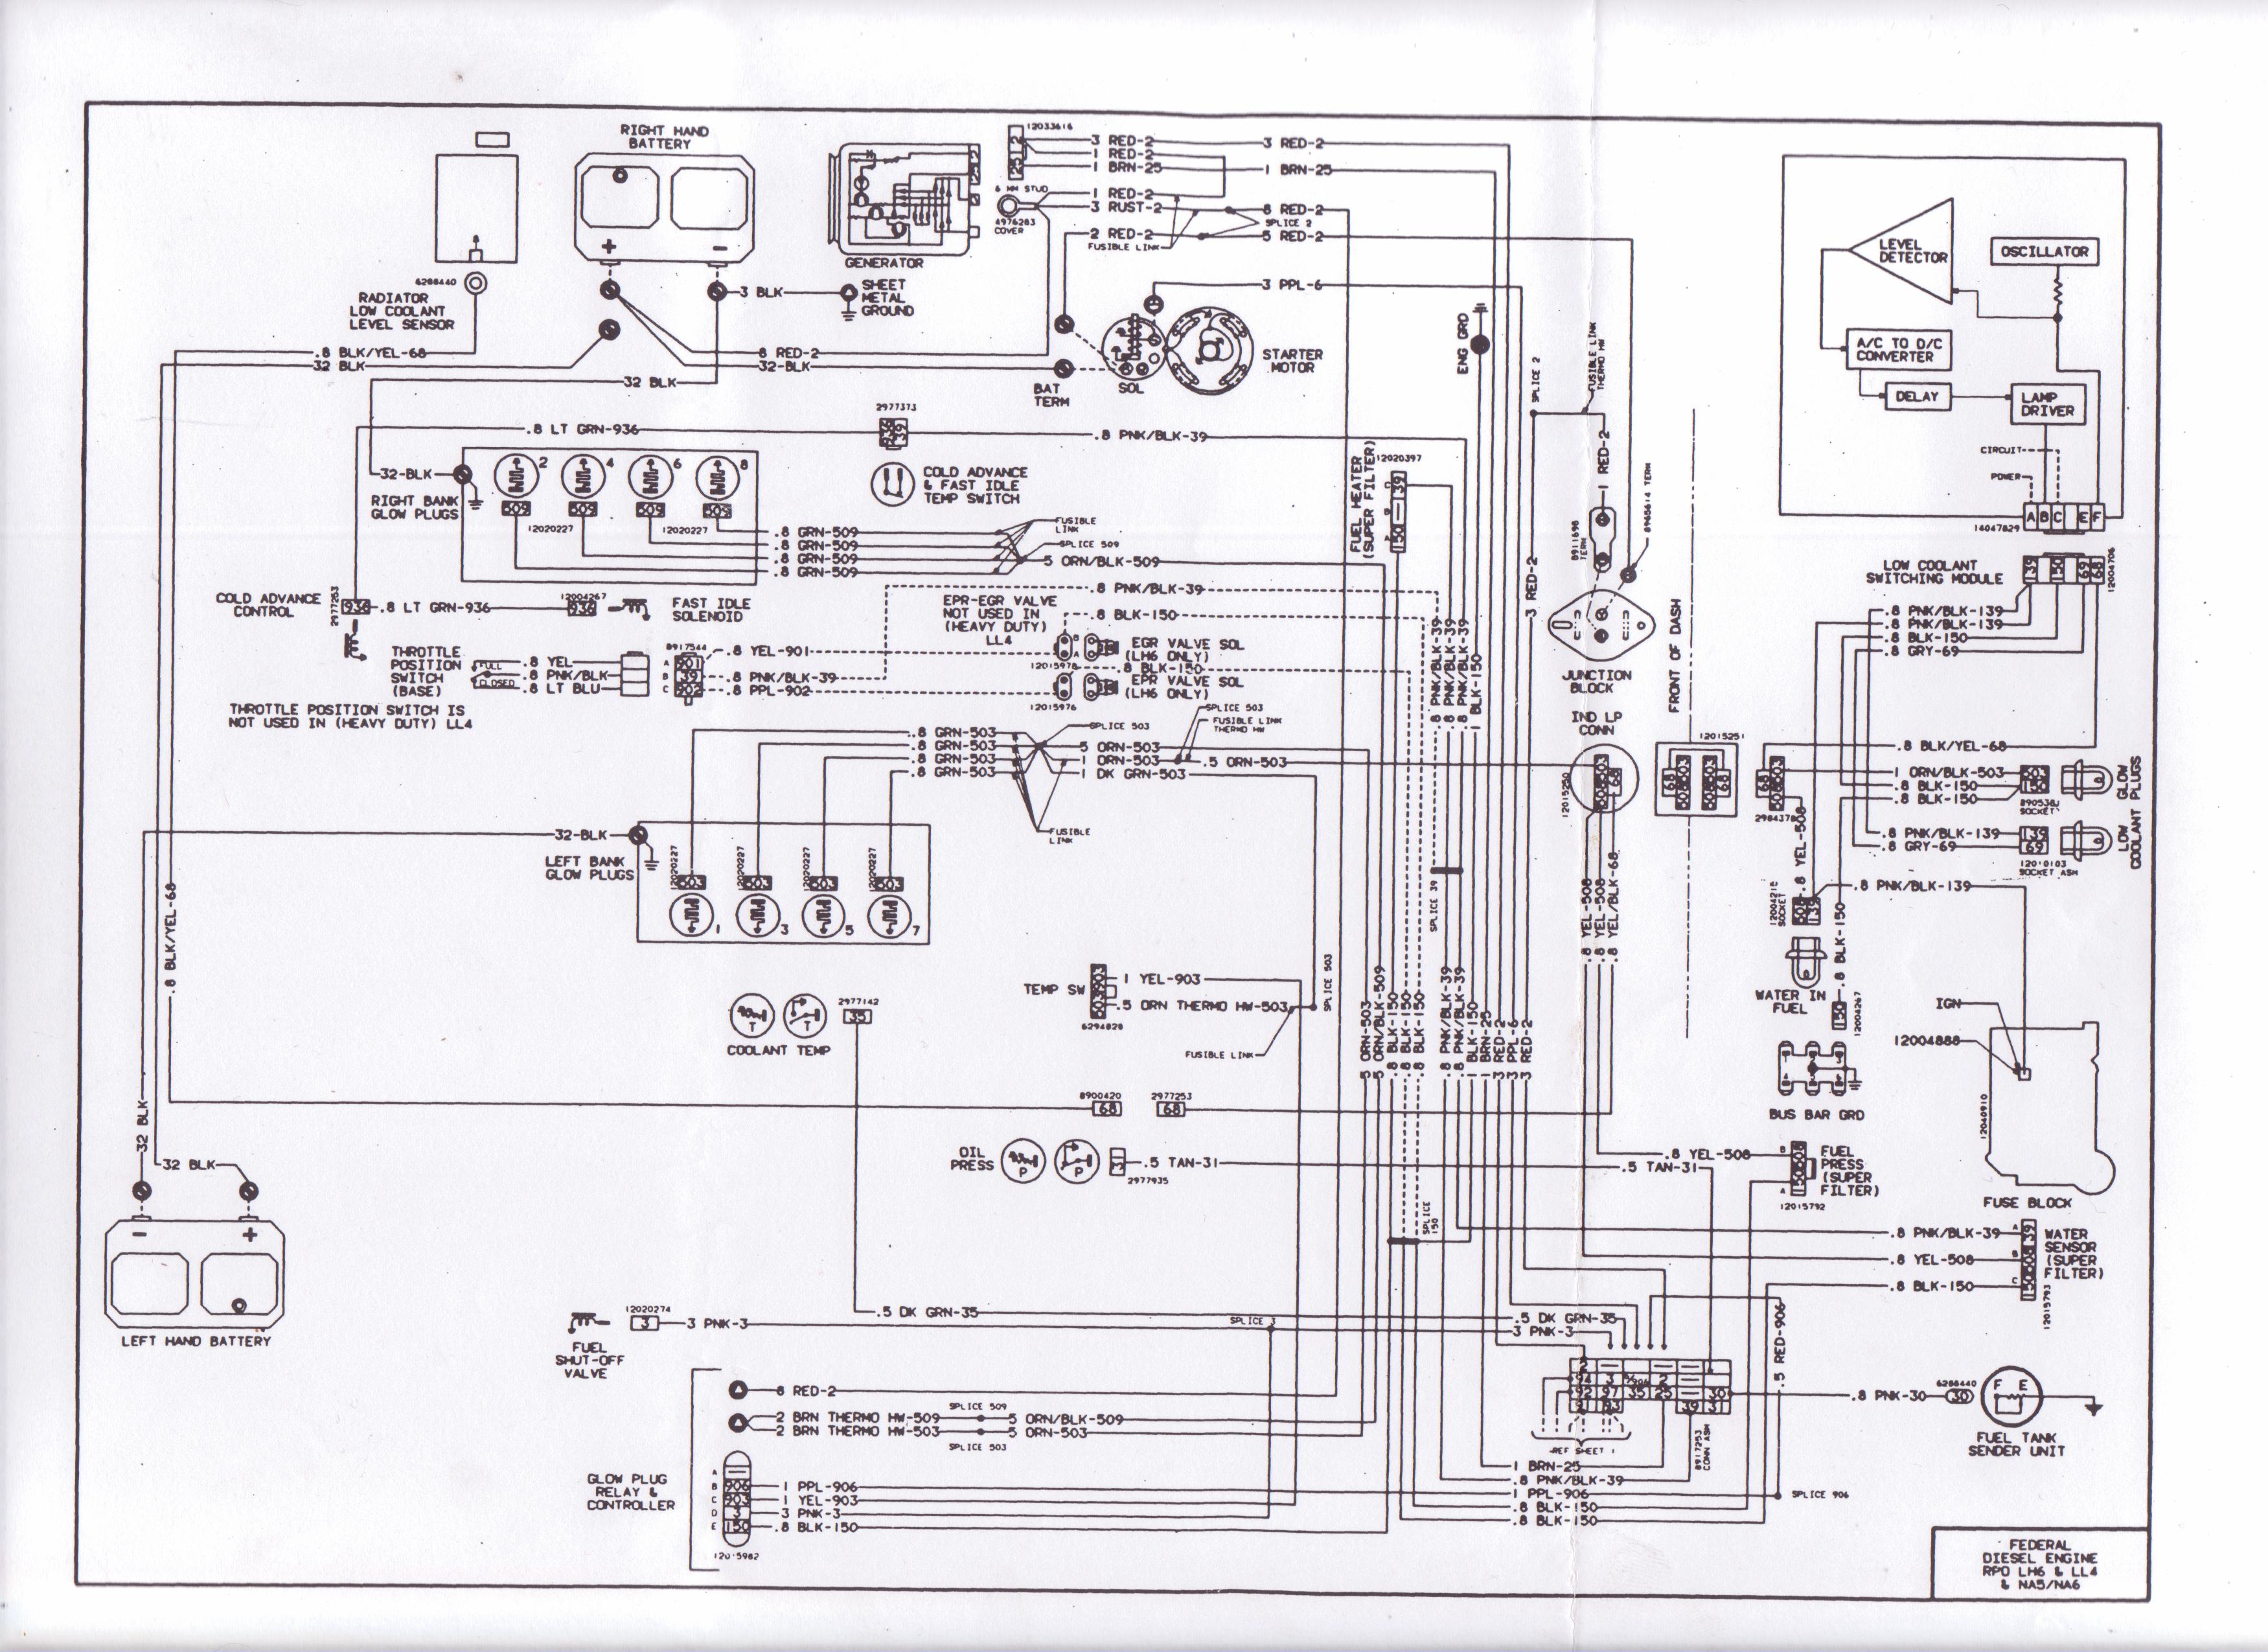 Awesome K1500 Trailer Wiring Diagram Wiring Library Wiring Cloud Apomsimijknierdonabenoleattemohammedshrineorg